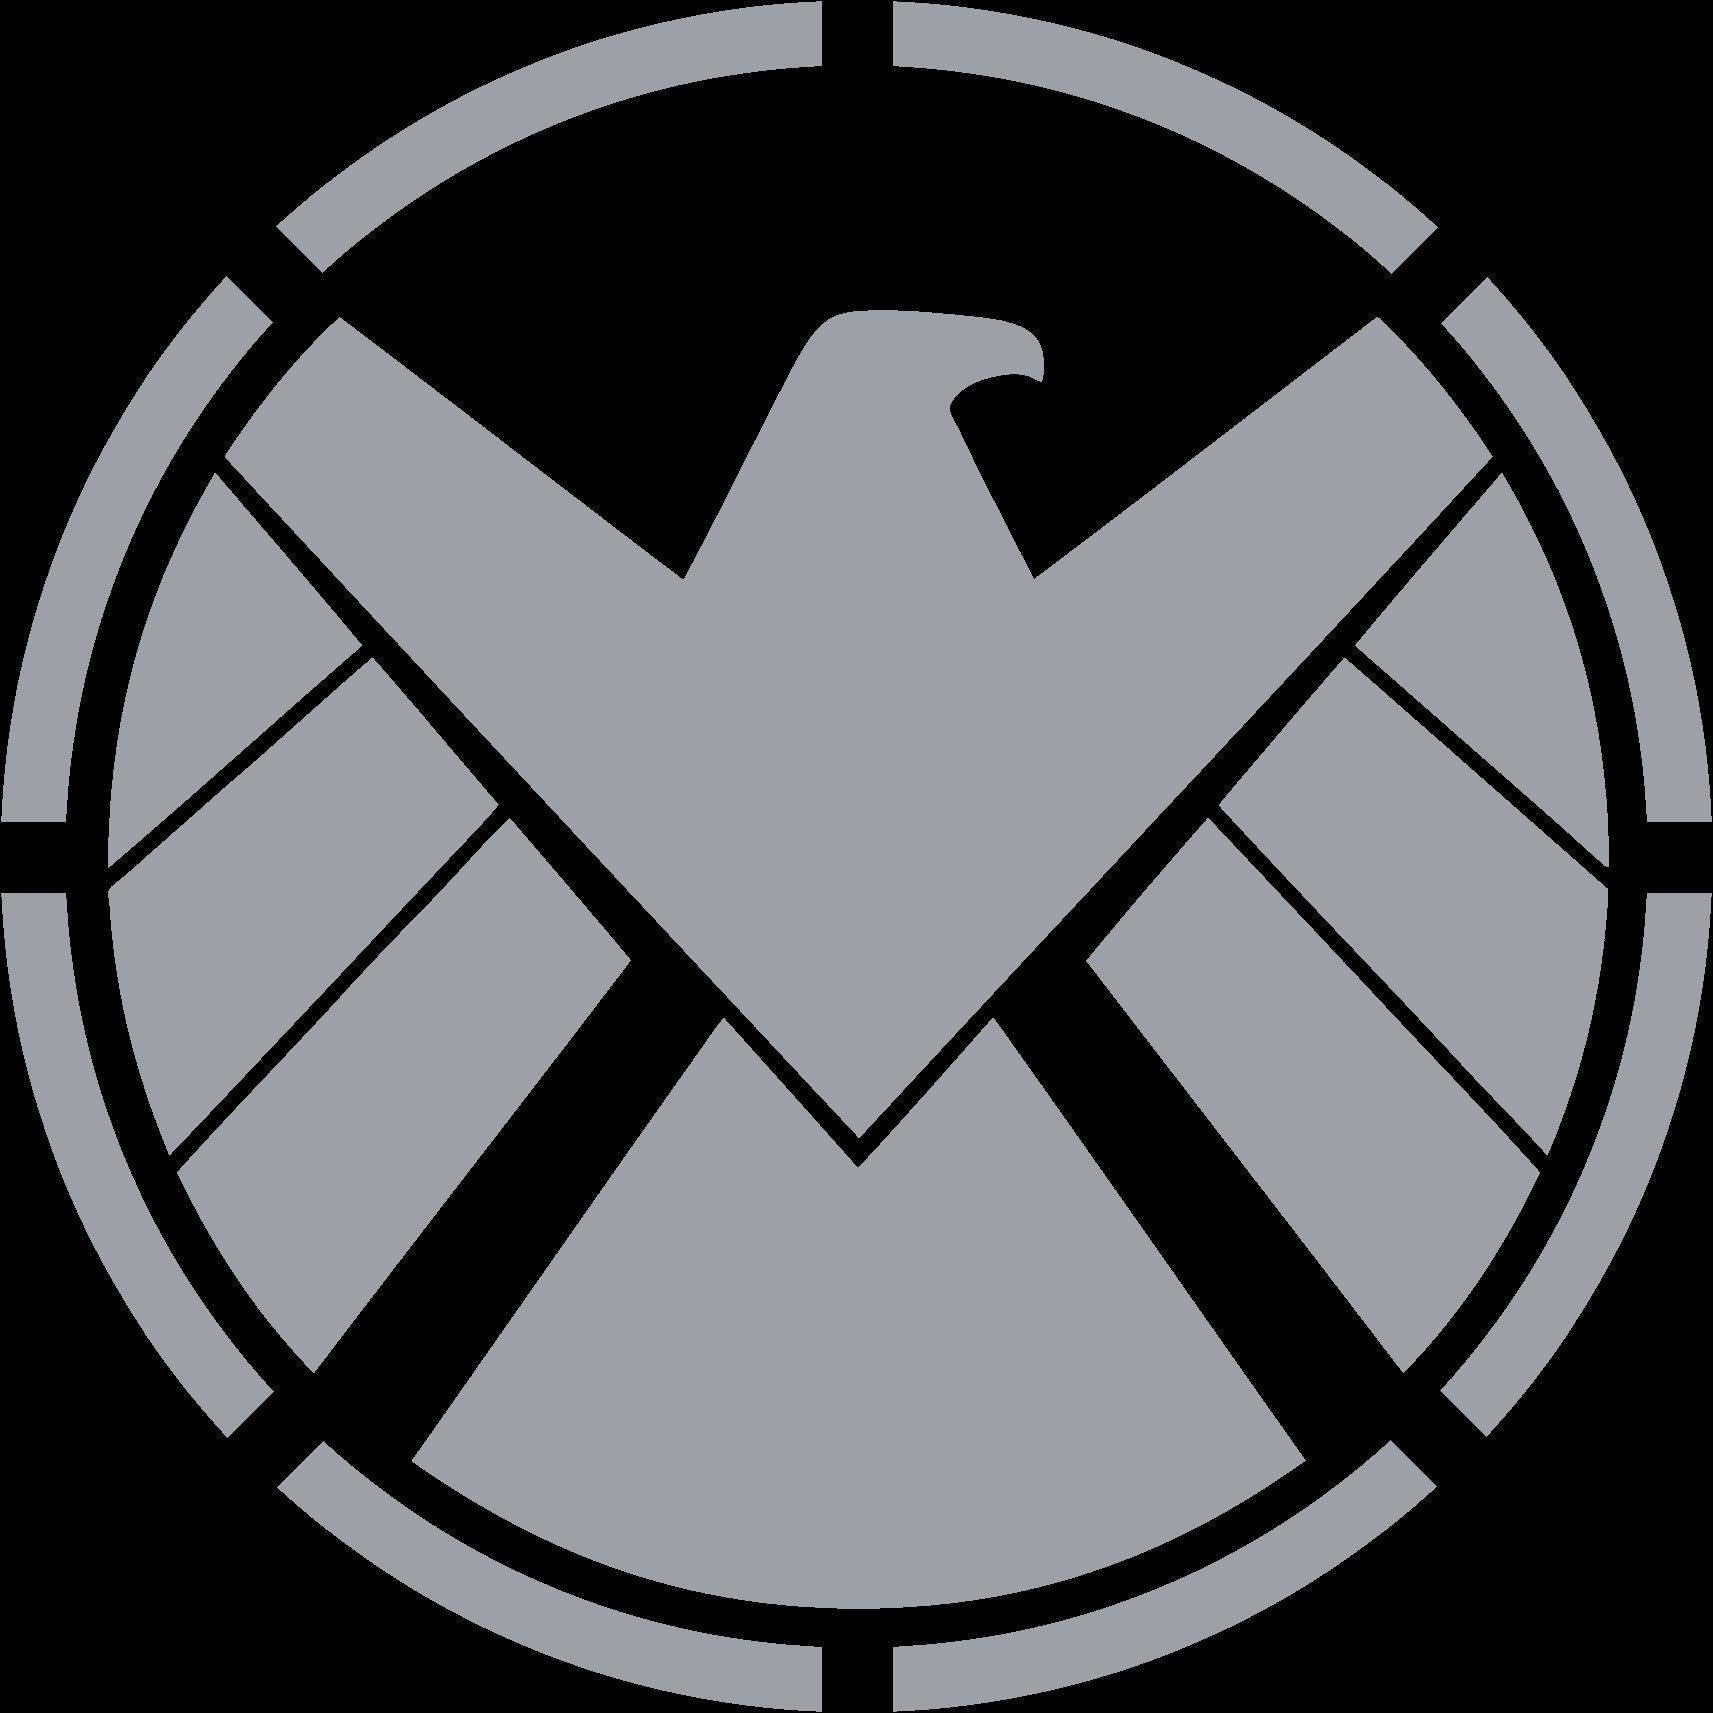 Image Shield Playgroundg Marvel Cinematic Universe Wiki